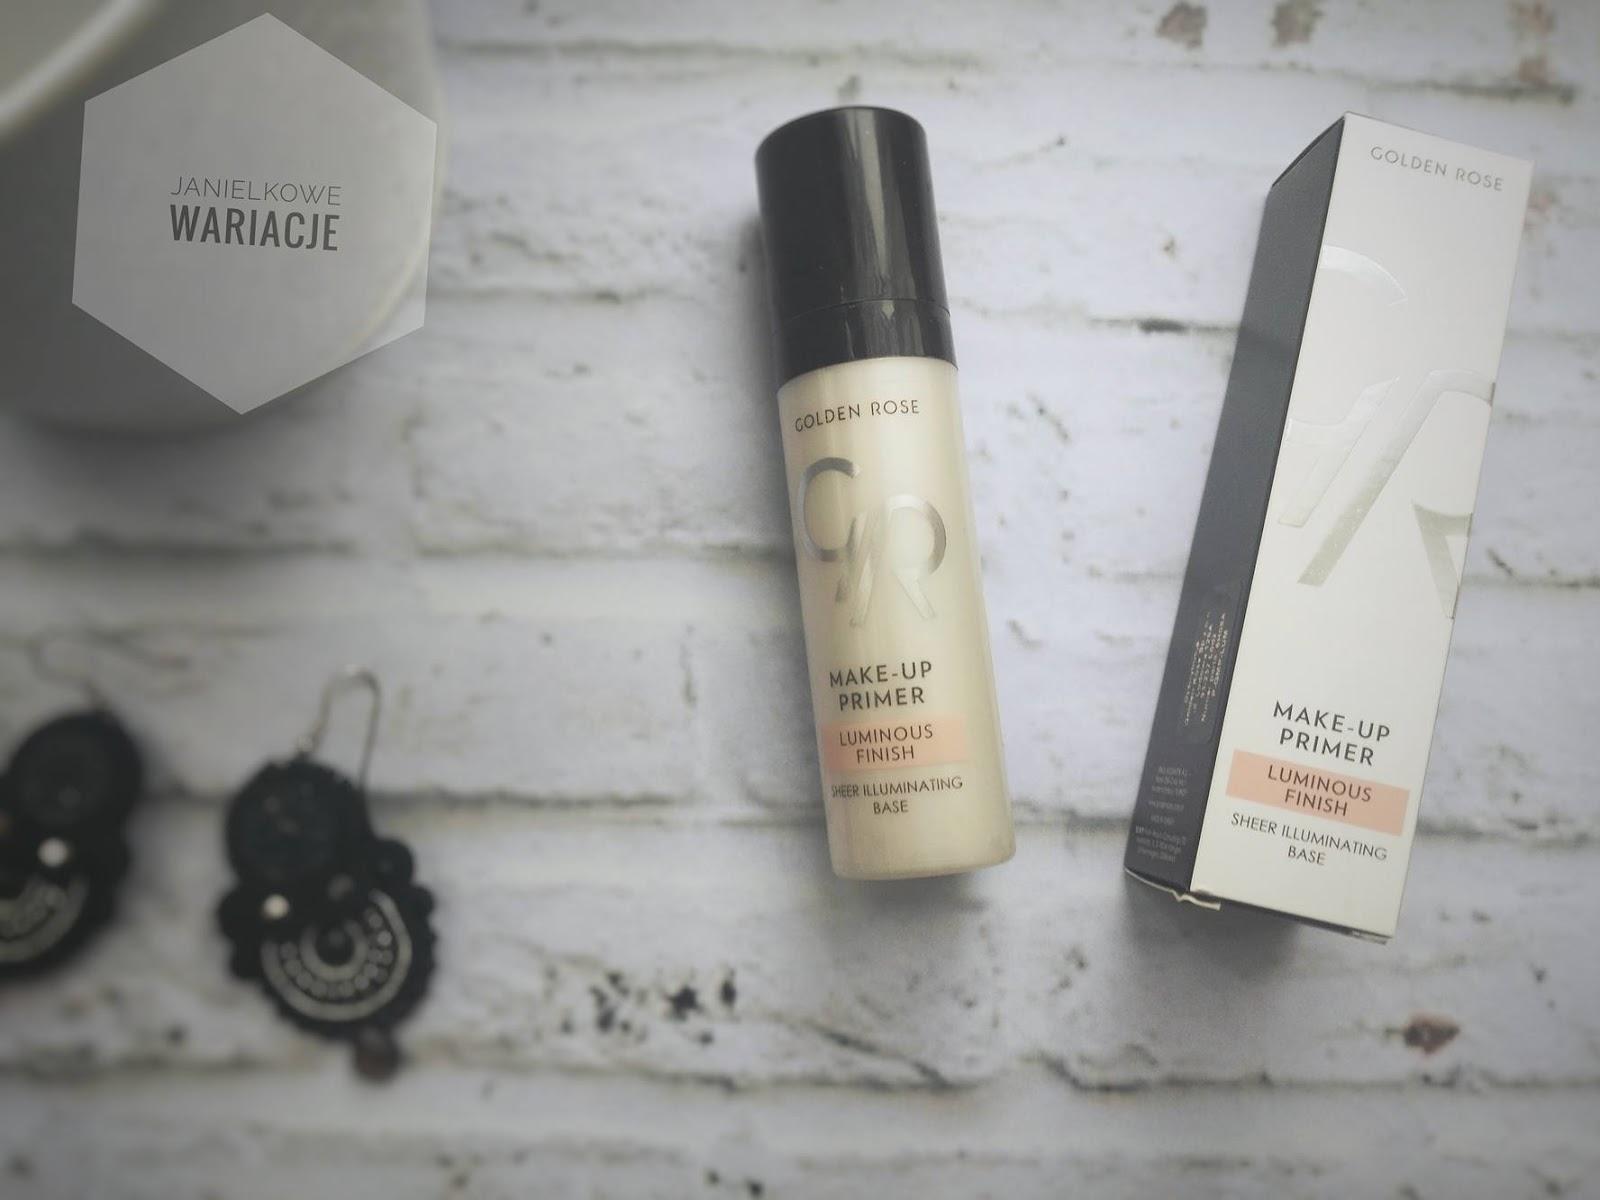 Make-Up Primer Luminous - Rozświetlająca baza pod makijaż - Golden Rose